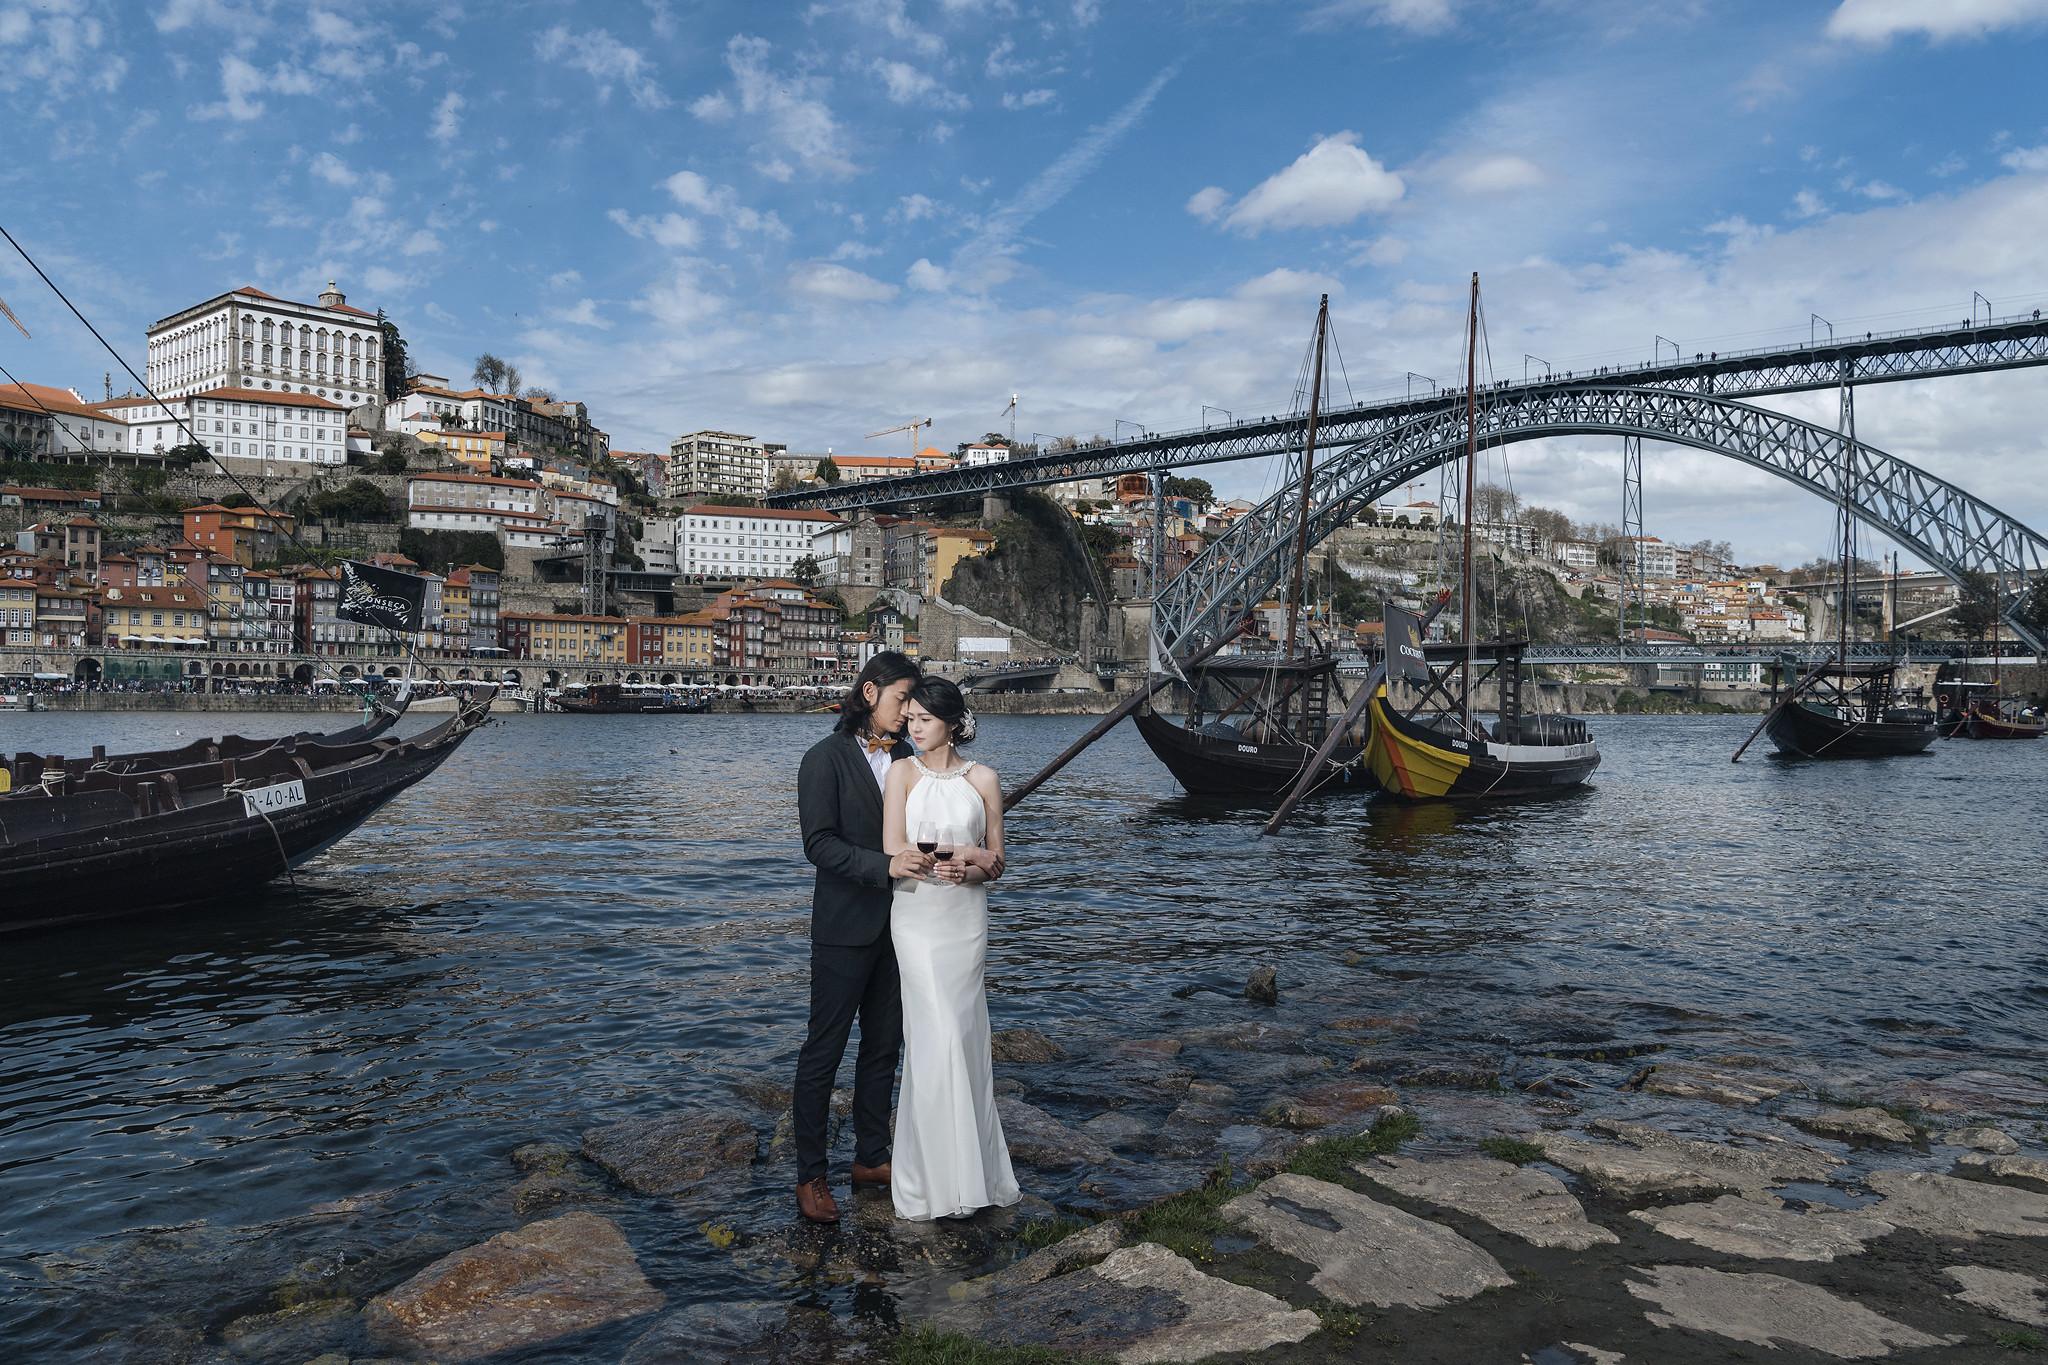 波多婚紗, 海外婚紗, 斗羅河, Porto, Donfer, EW, EASTERNWEDDING